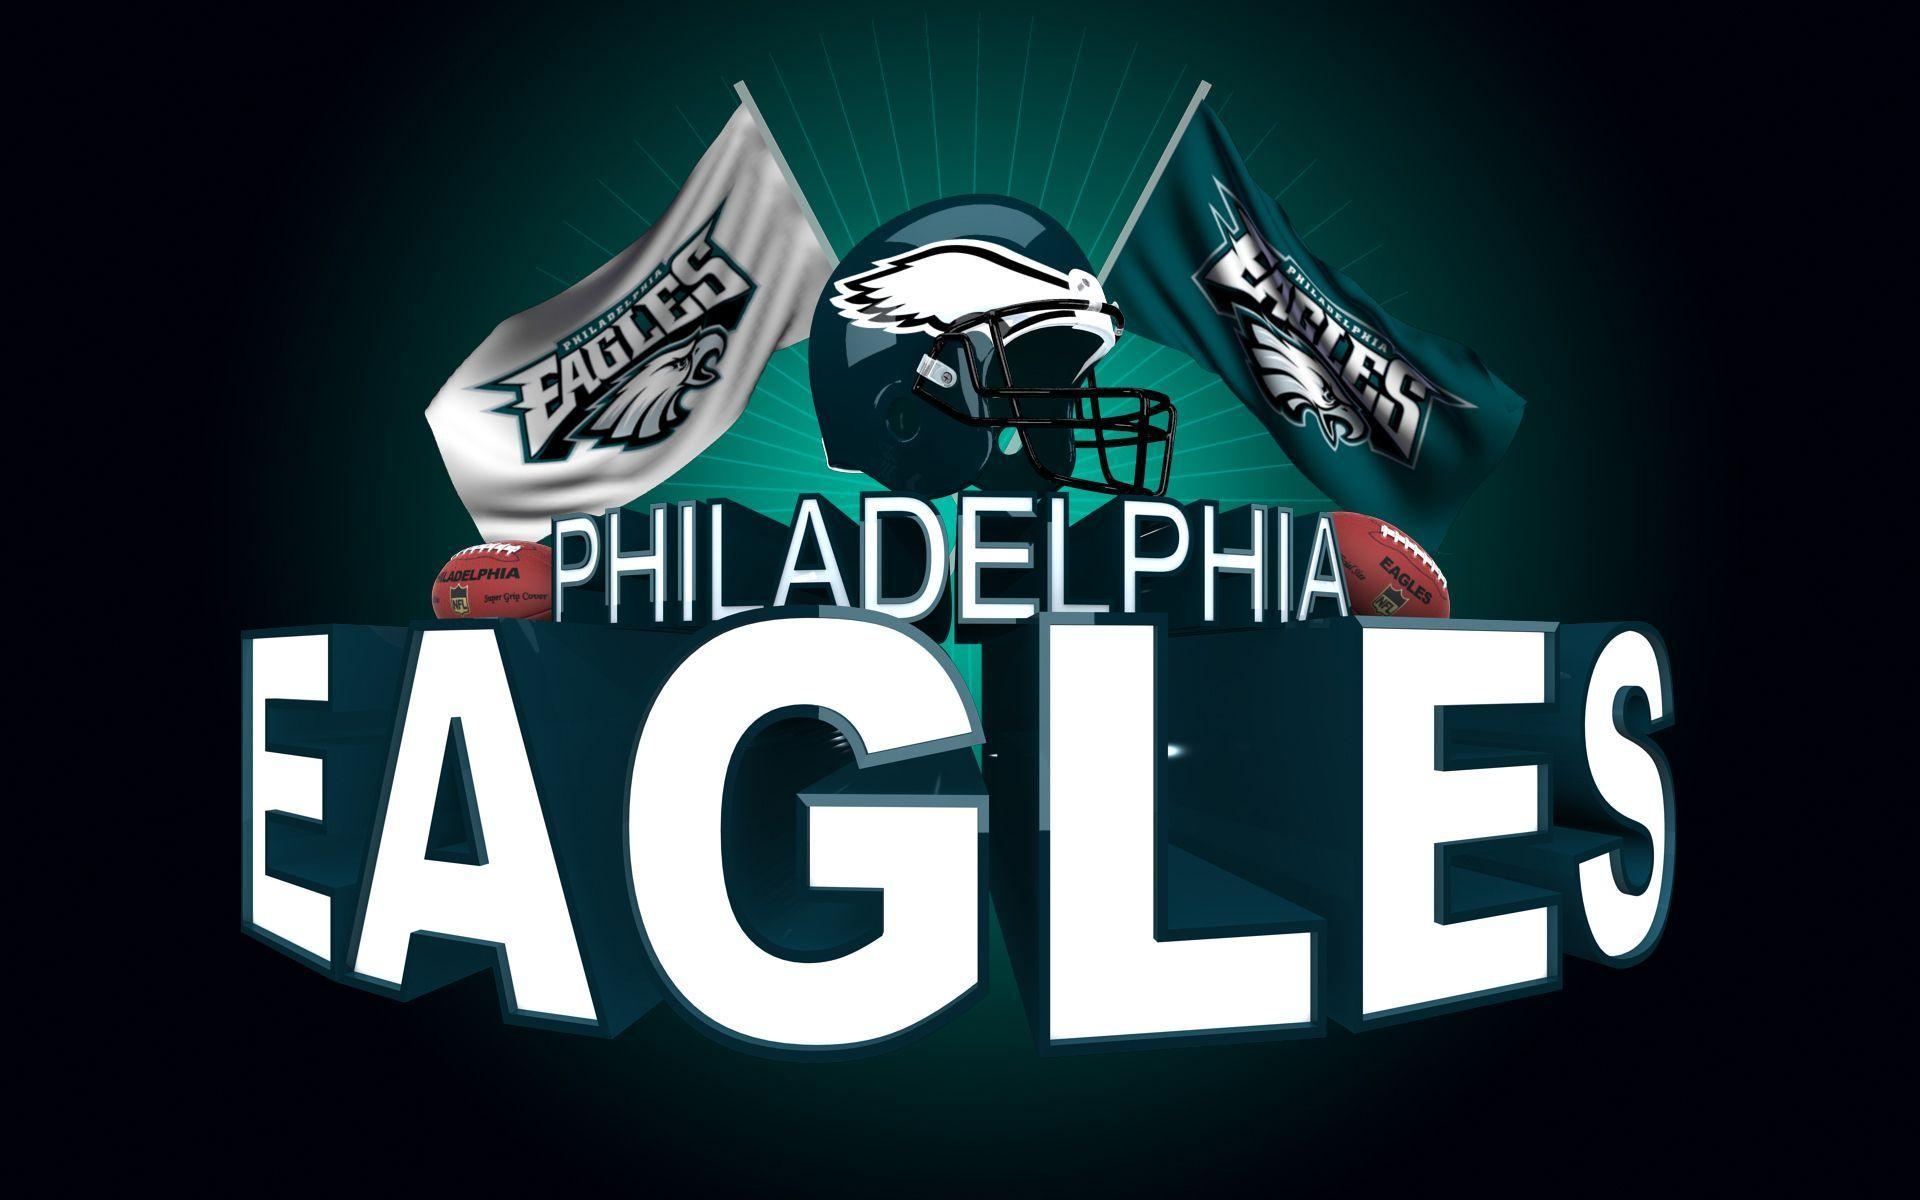 Cool Philadelphia Eagles Wallpapers Hd